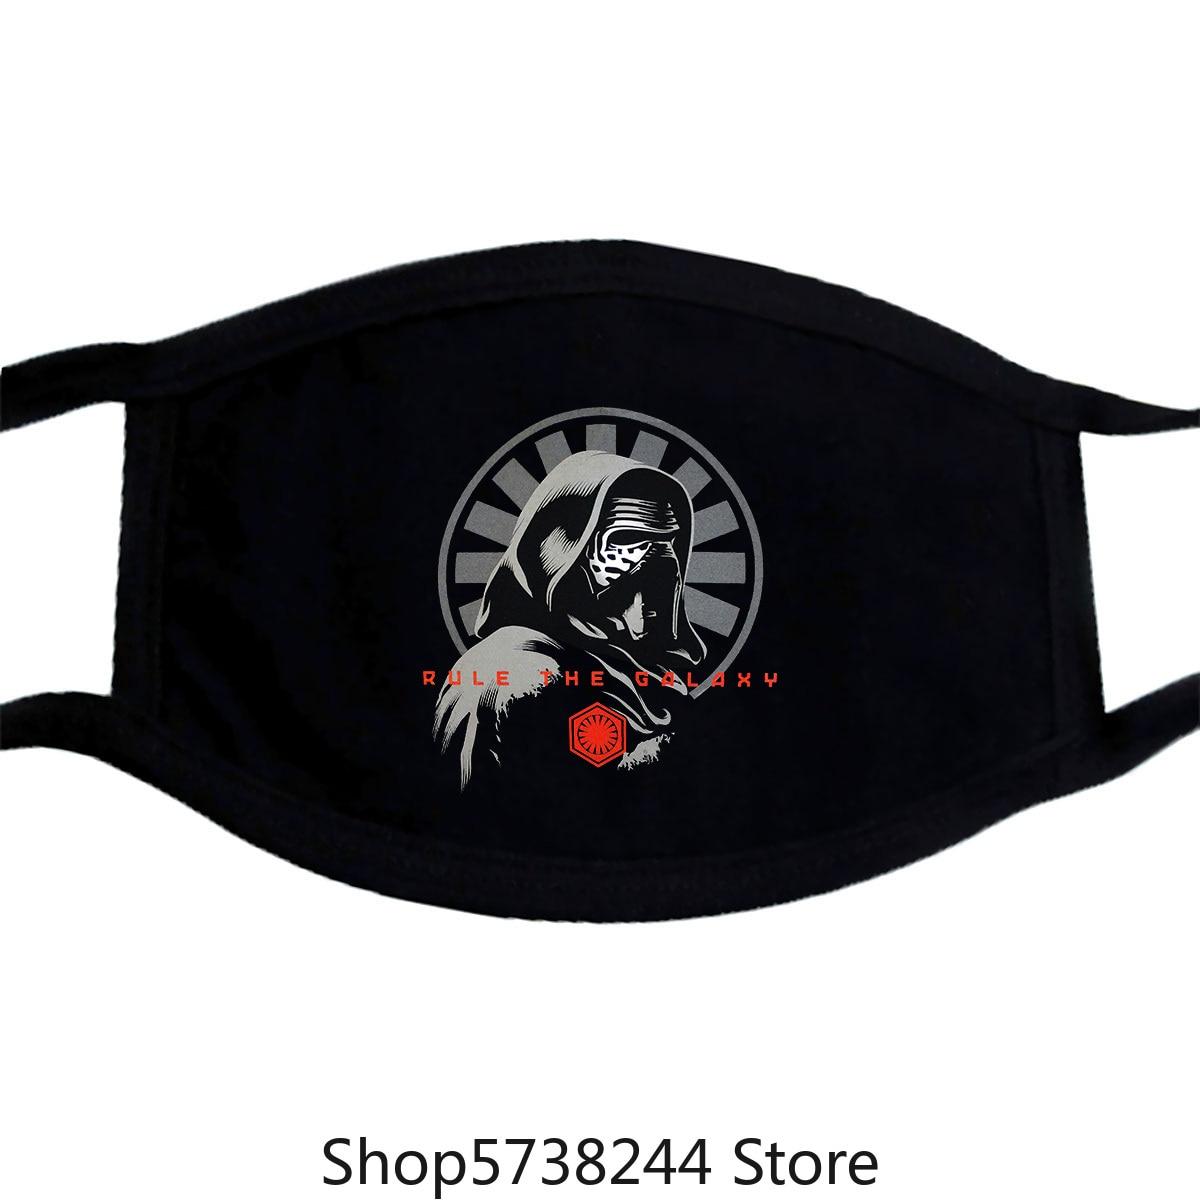 Star Kylo Ren Rule The Galaxy Rise Of Skywalker Black Men Mask Washable Reusable Mask